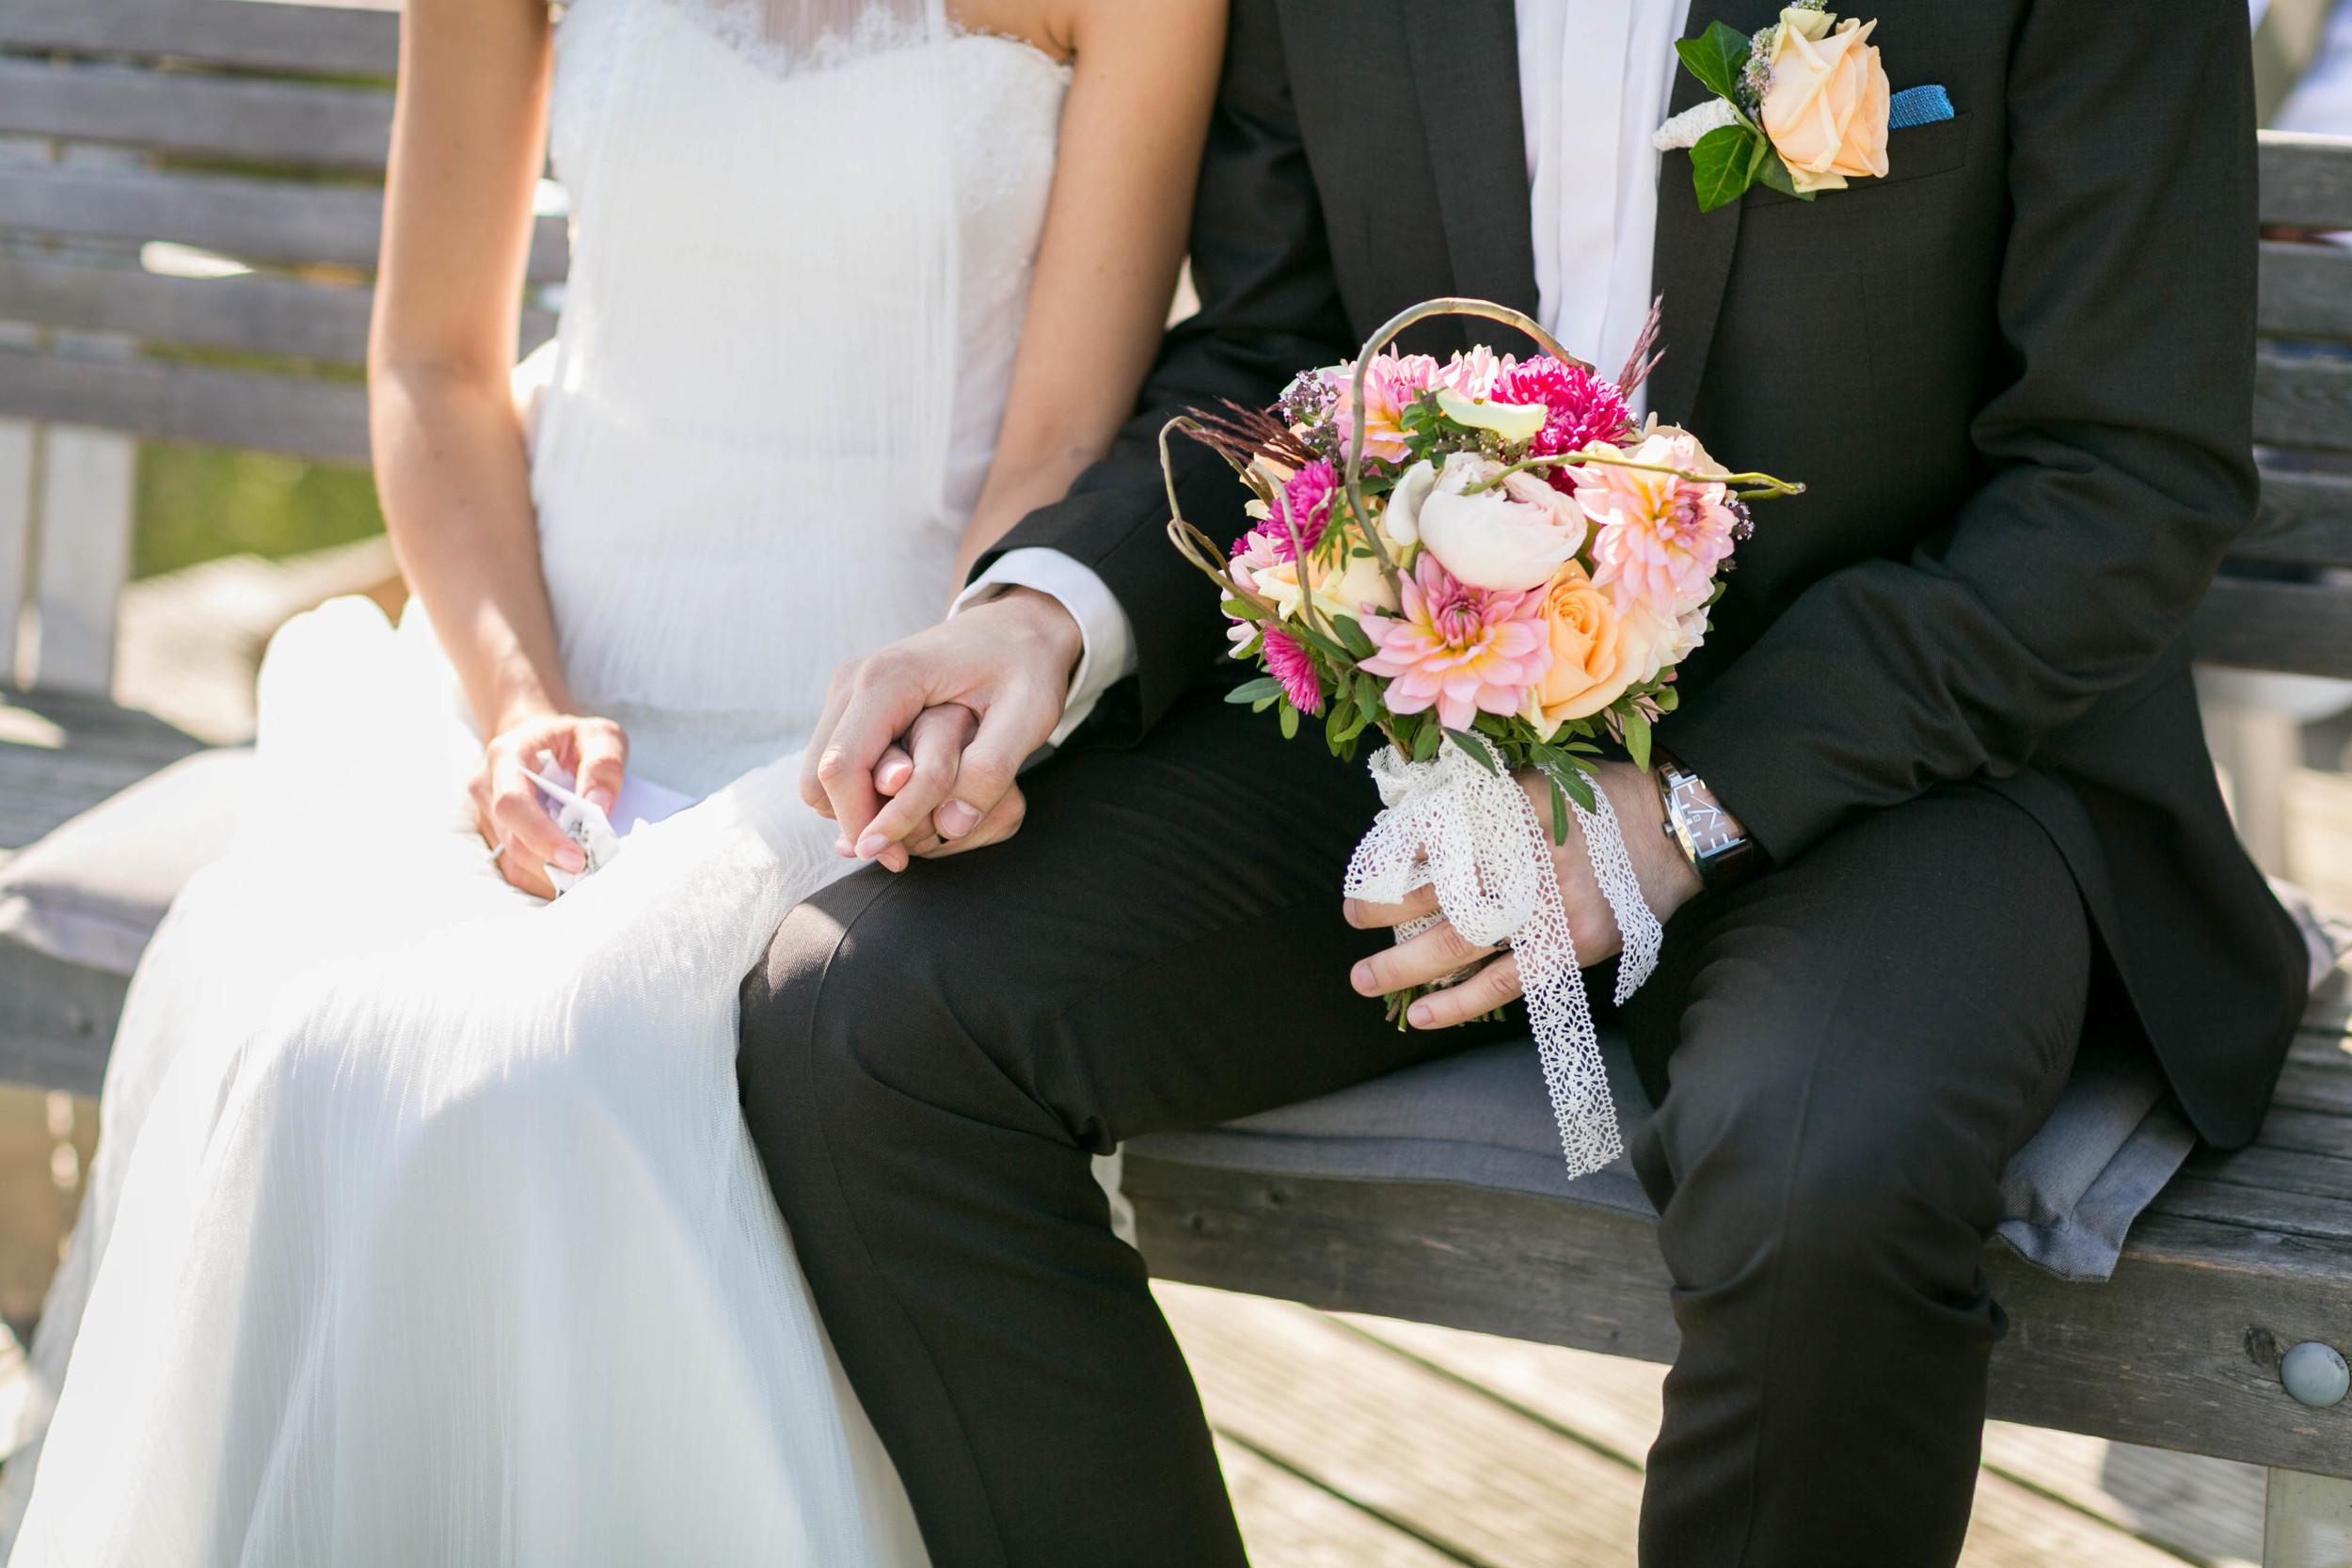 Fran Burrows Hochzeitsfotografie_Kulturgut Wrechen Hochzeit-17.jpg